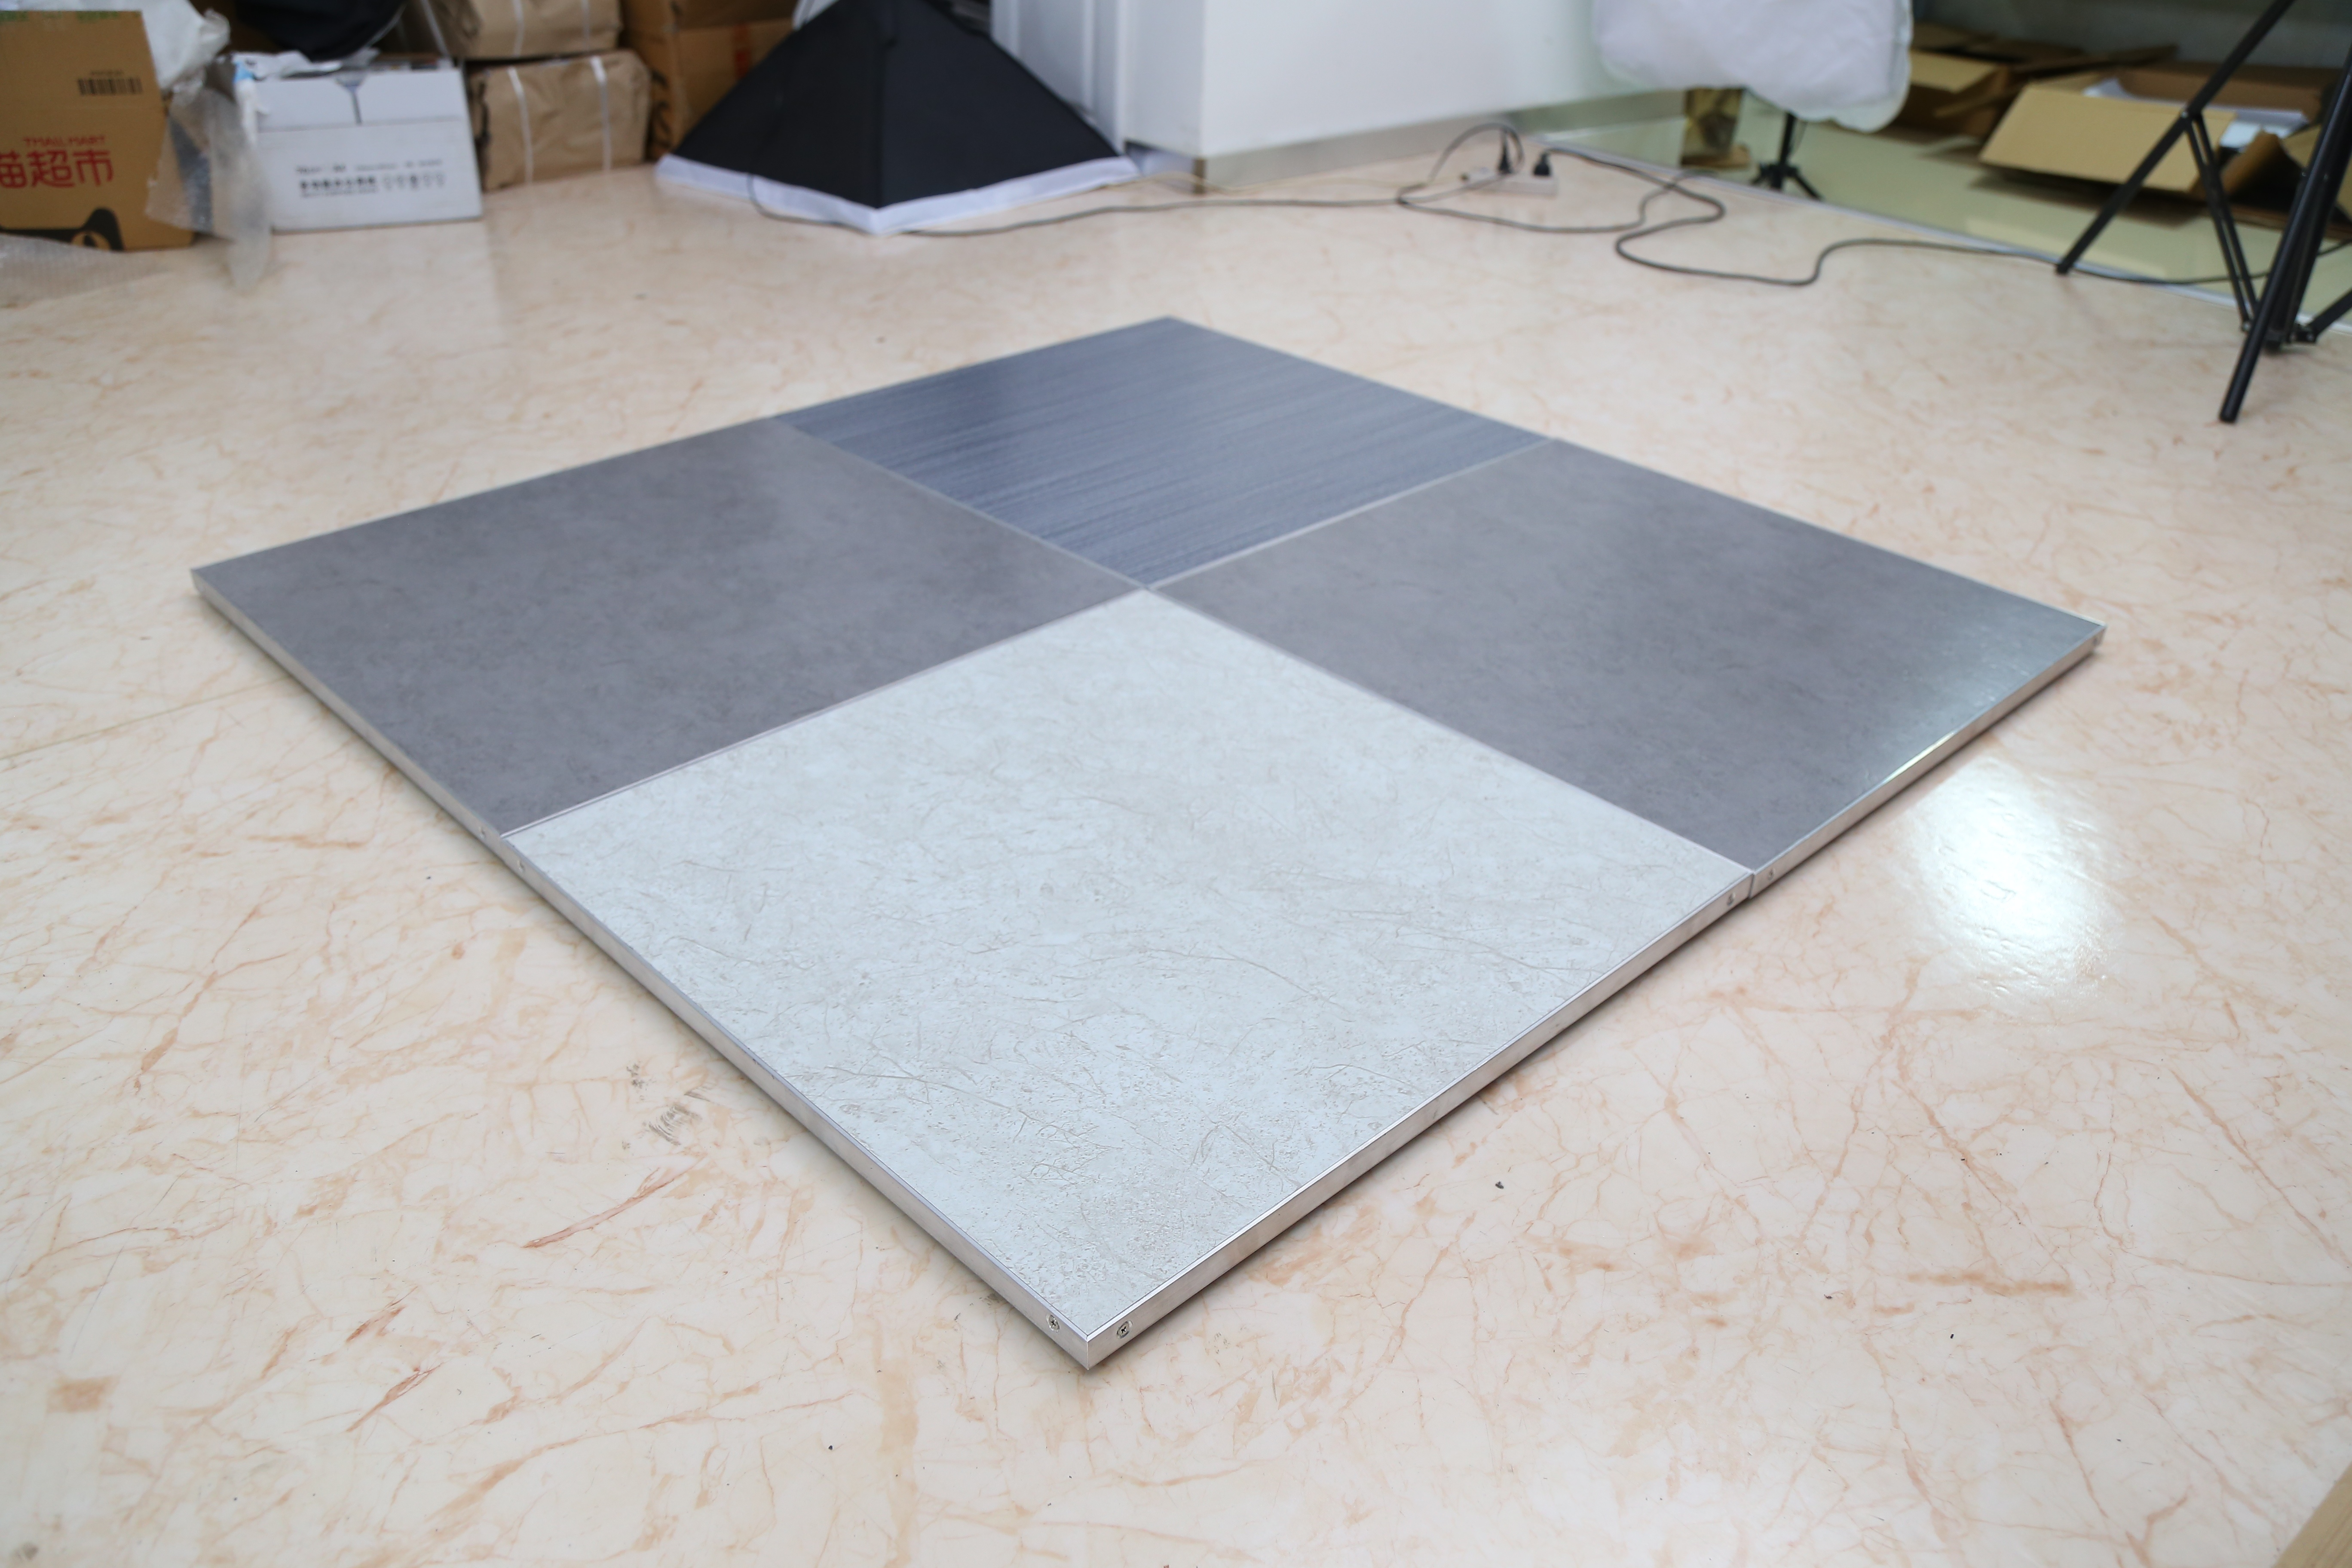 Multifunction portable wood look dance floor 1x1m waterproof